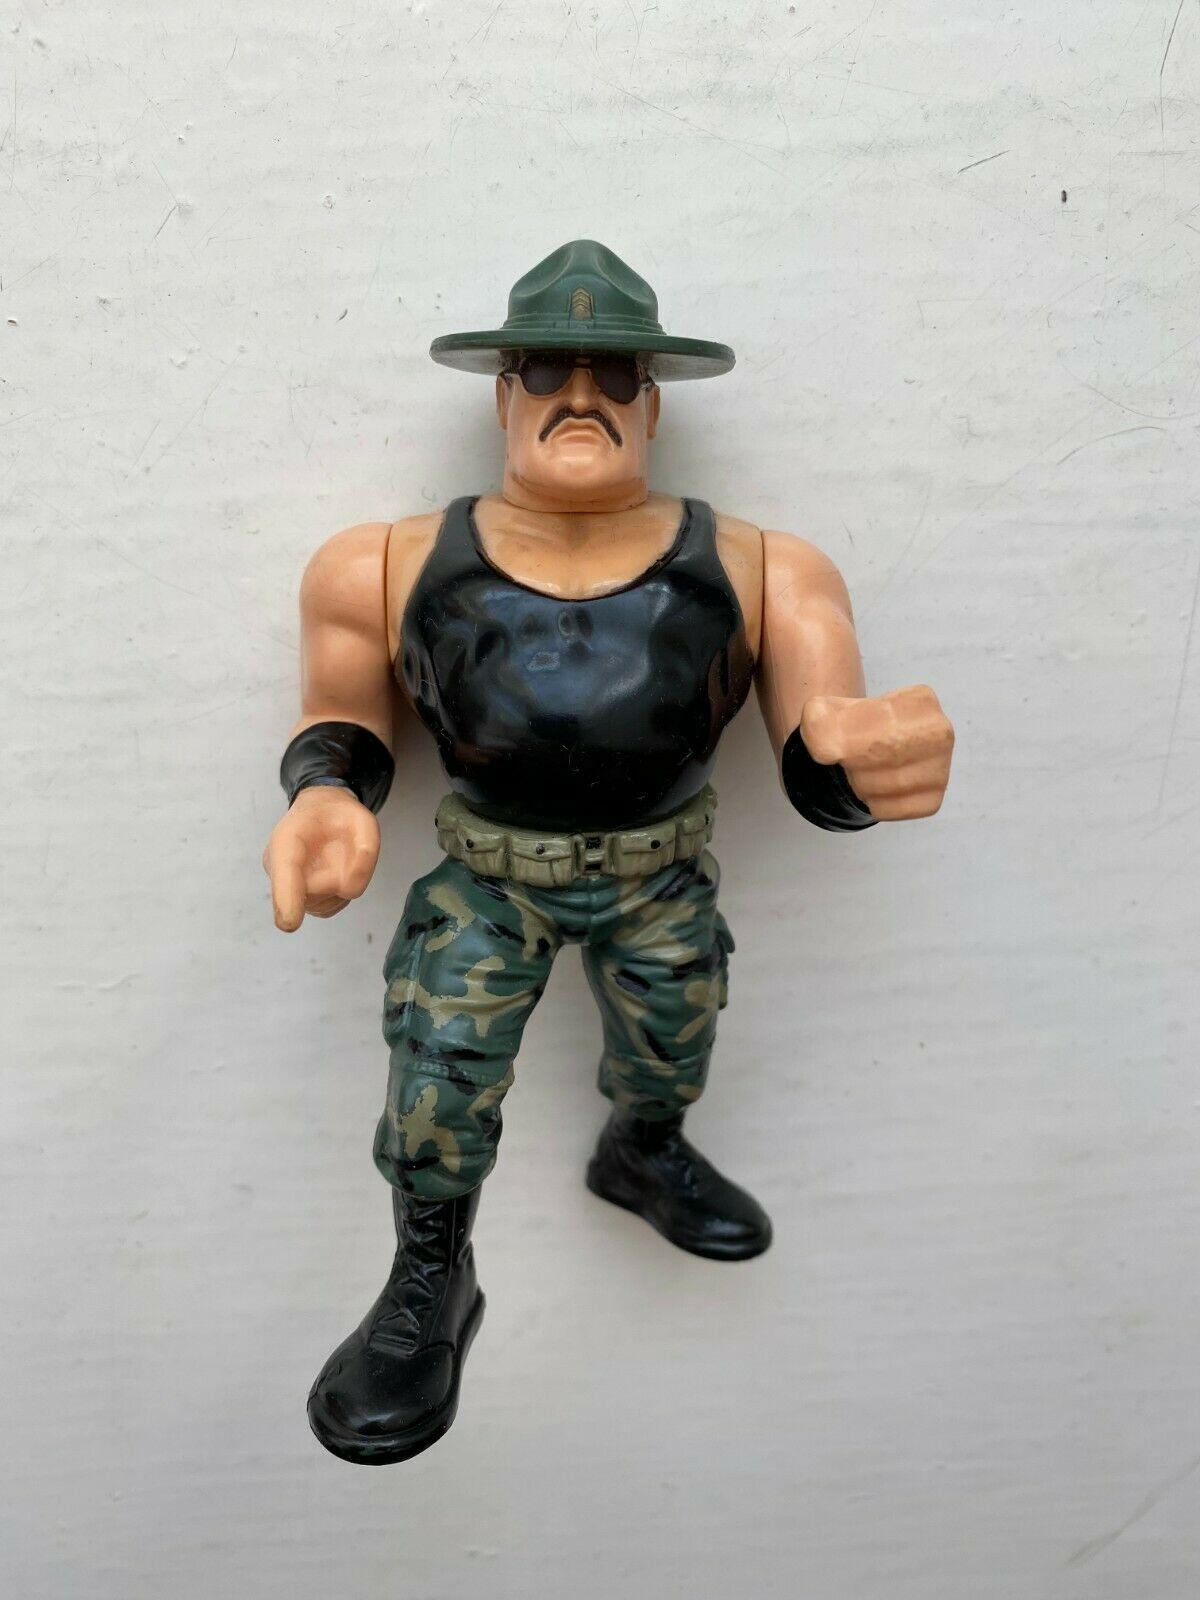 Hasbro WWF Sgt. Slaughter